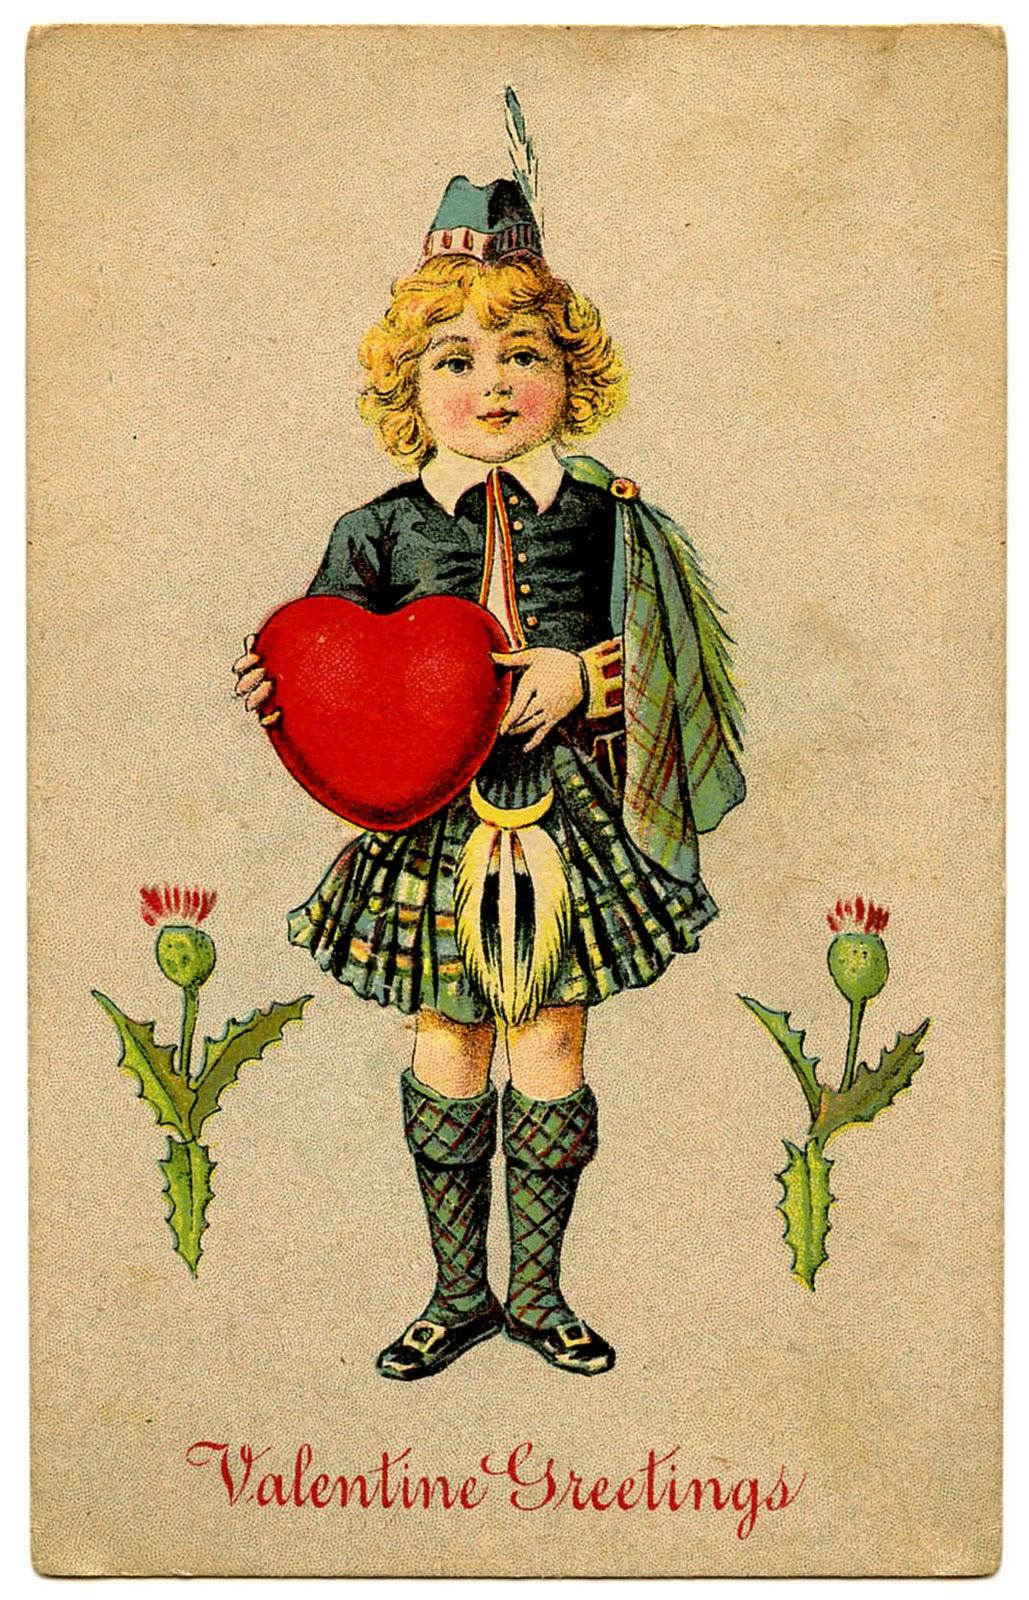 Vintage Valentine Clip Art - The Graphics Fairy - Free Printable Vintage Valentine Clip Art